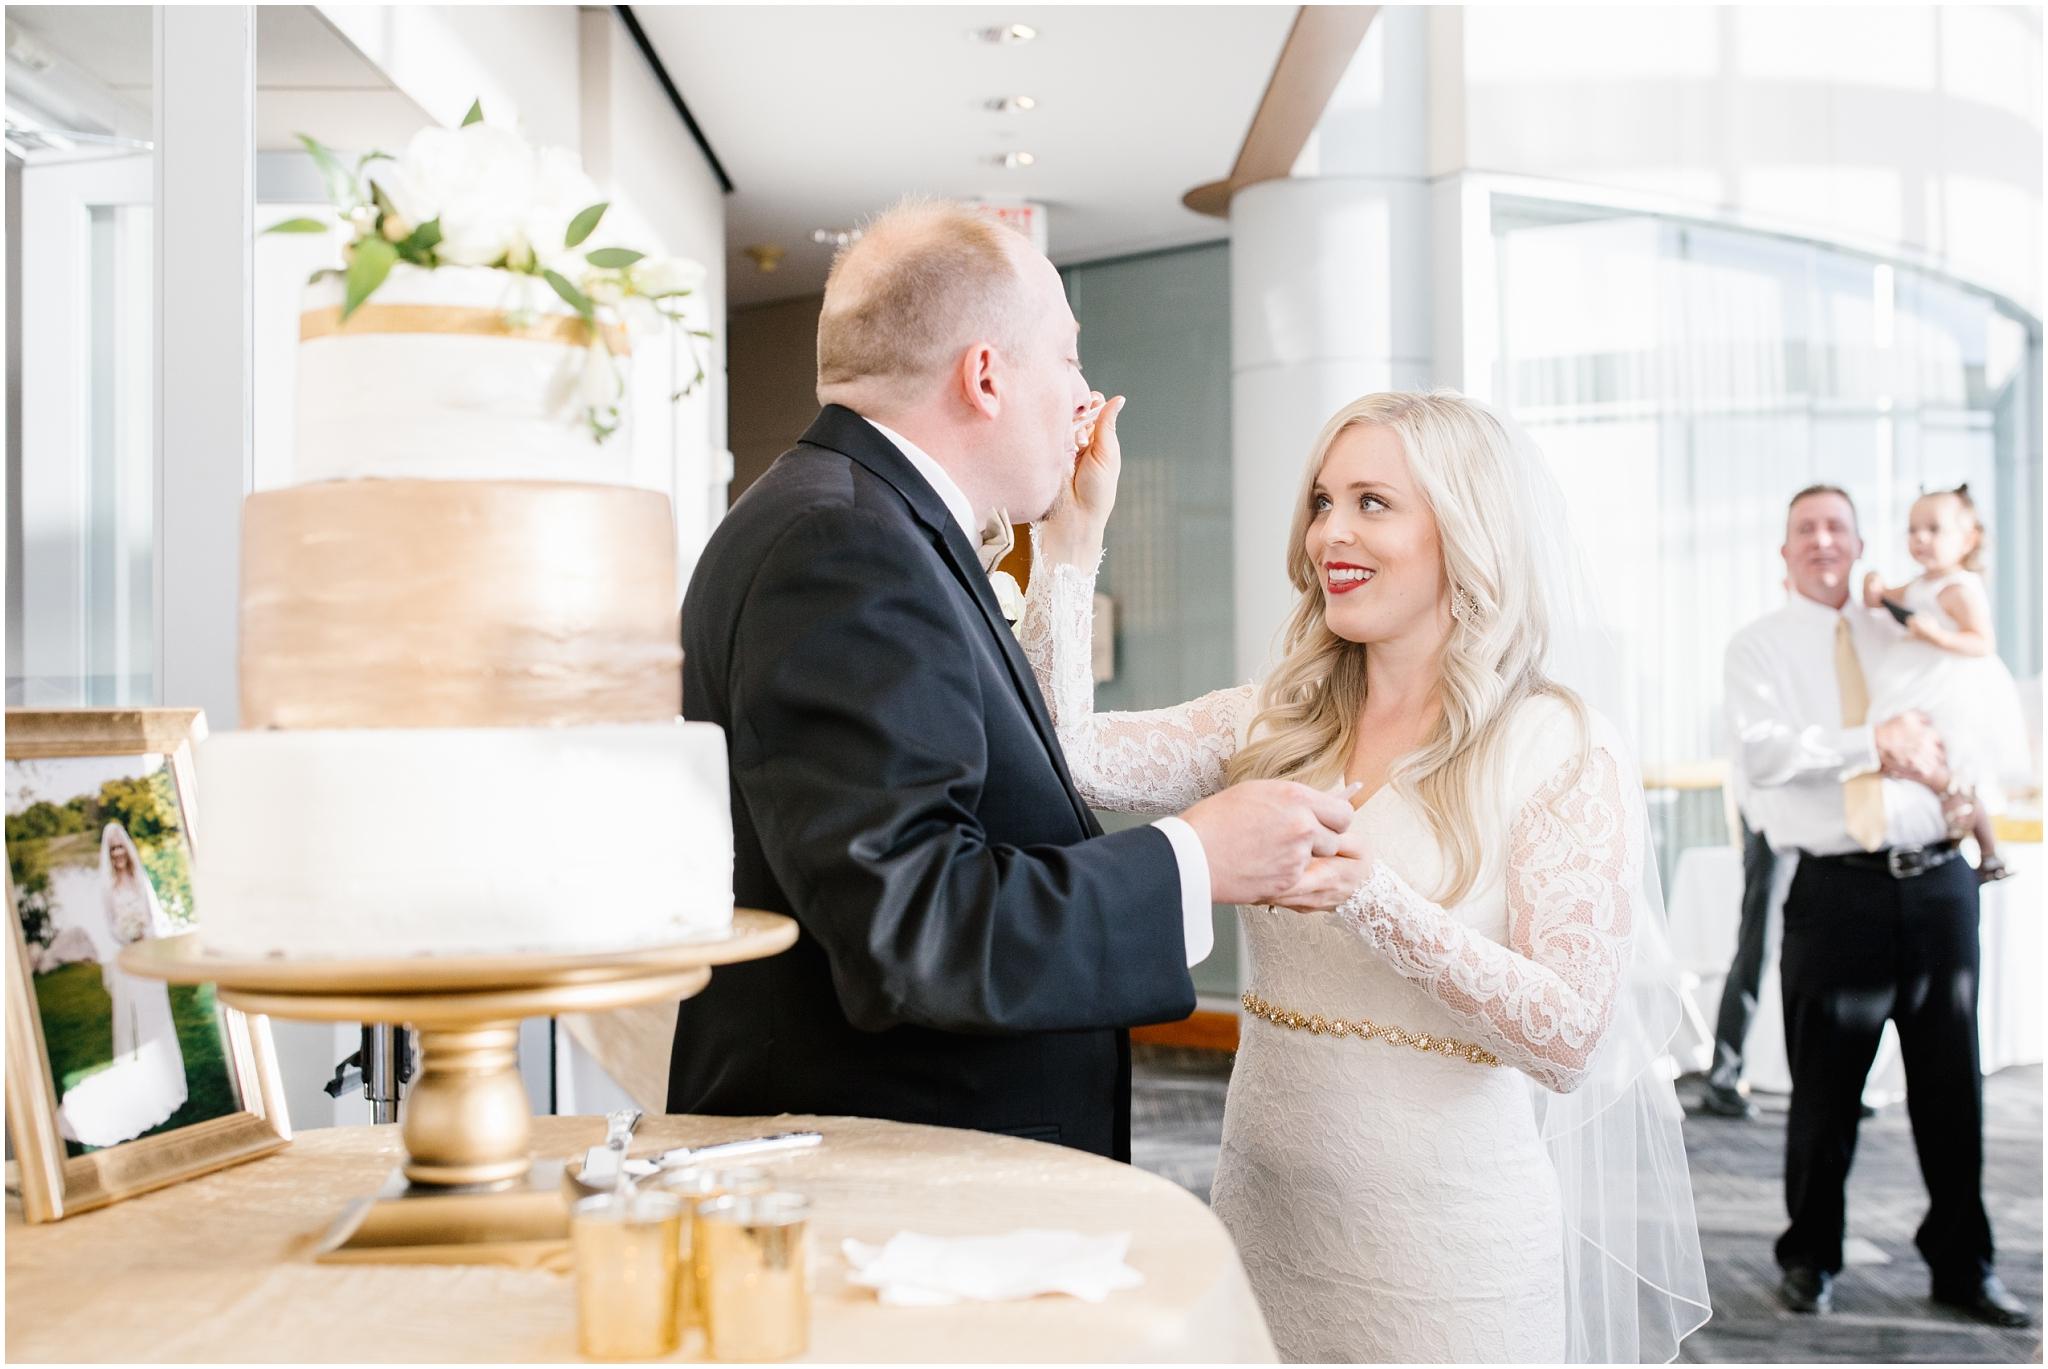 CherylandTyler-520_Lizzie-B-Imagery-Utah-Wedding-Photographer-Salt-Lake-City-Temple-Wells-Fargo-Building-Reception.jpg